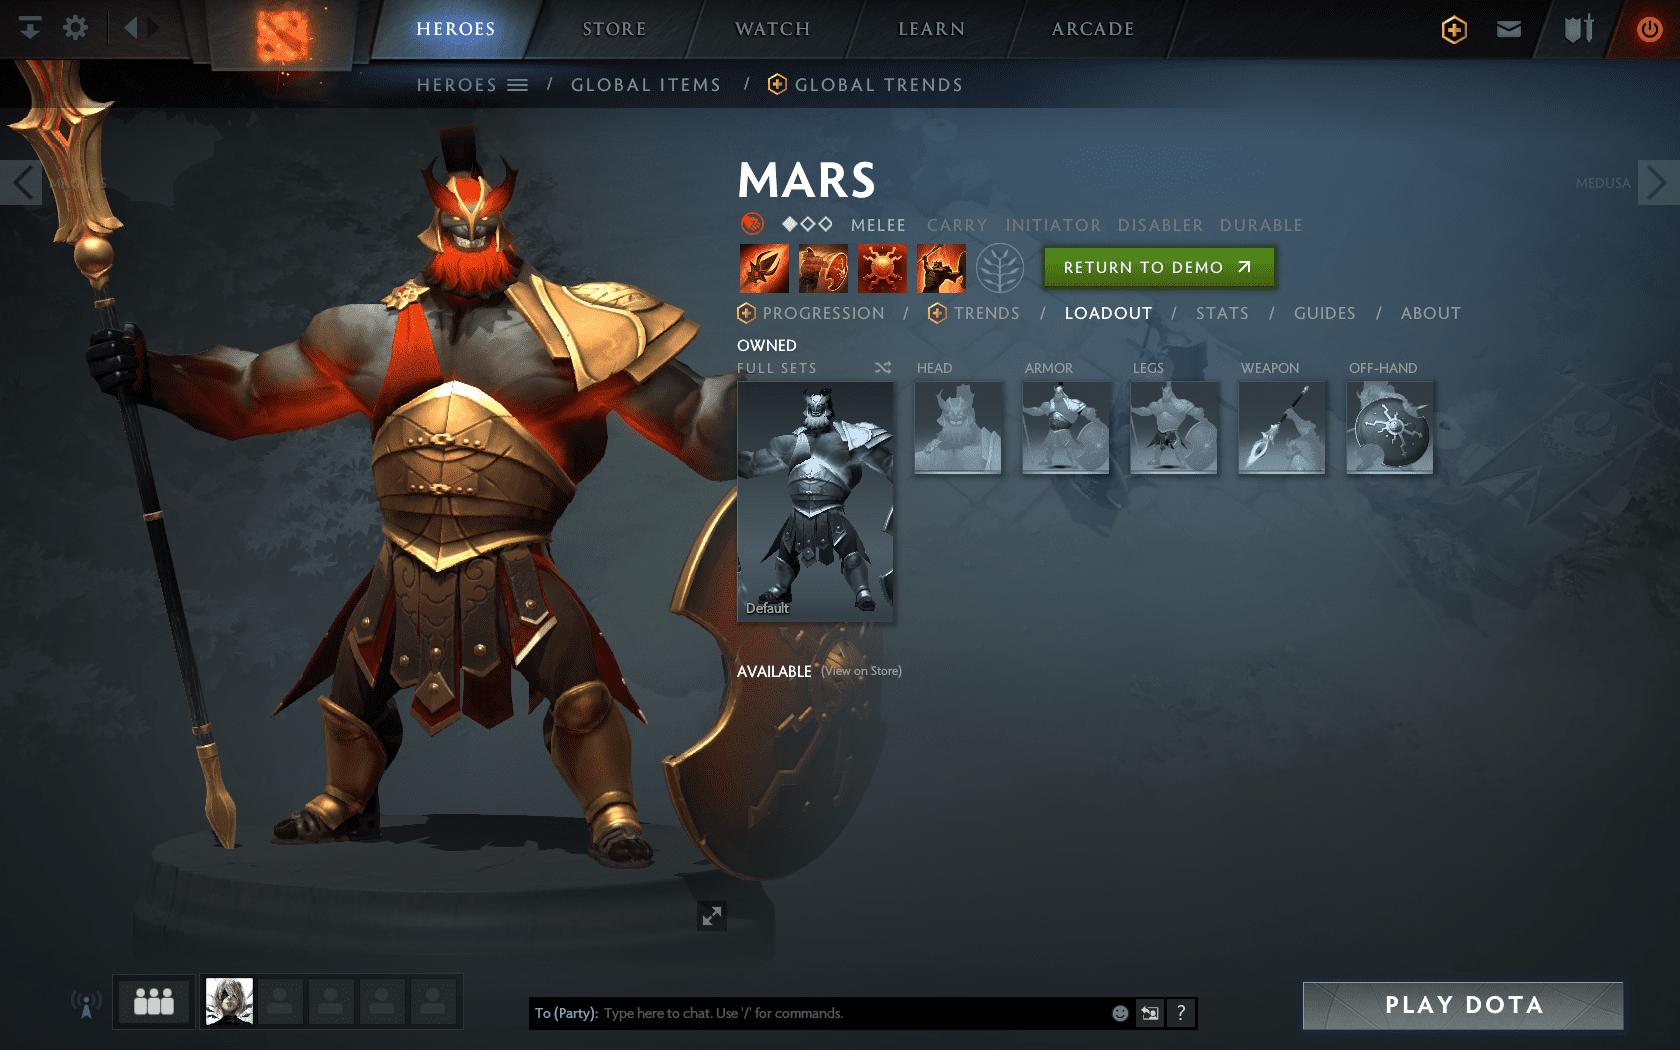 Dota 2 hero Mars in-game screenshot